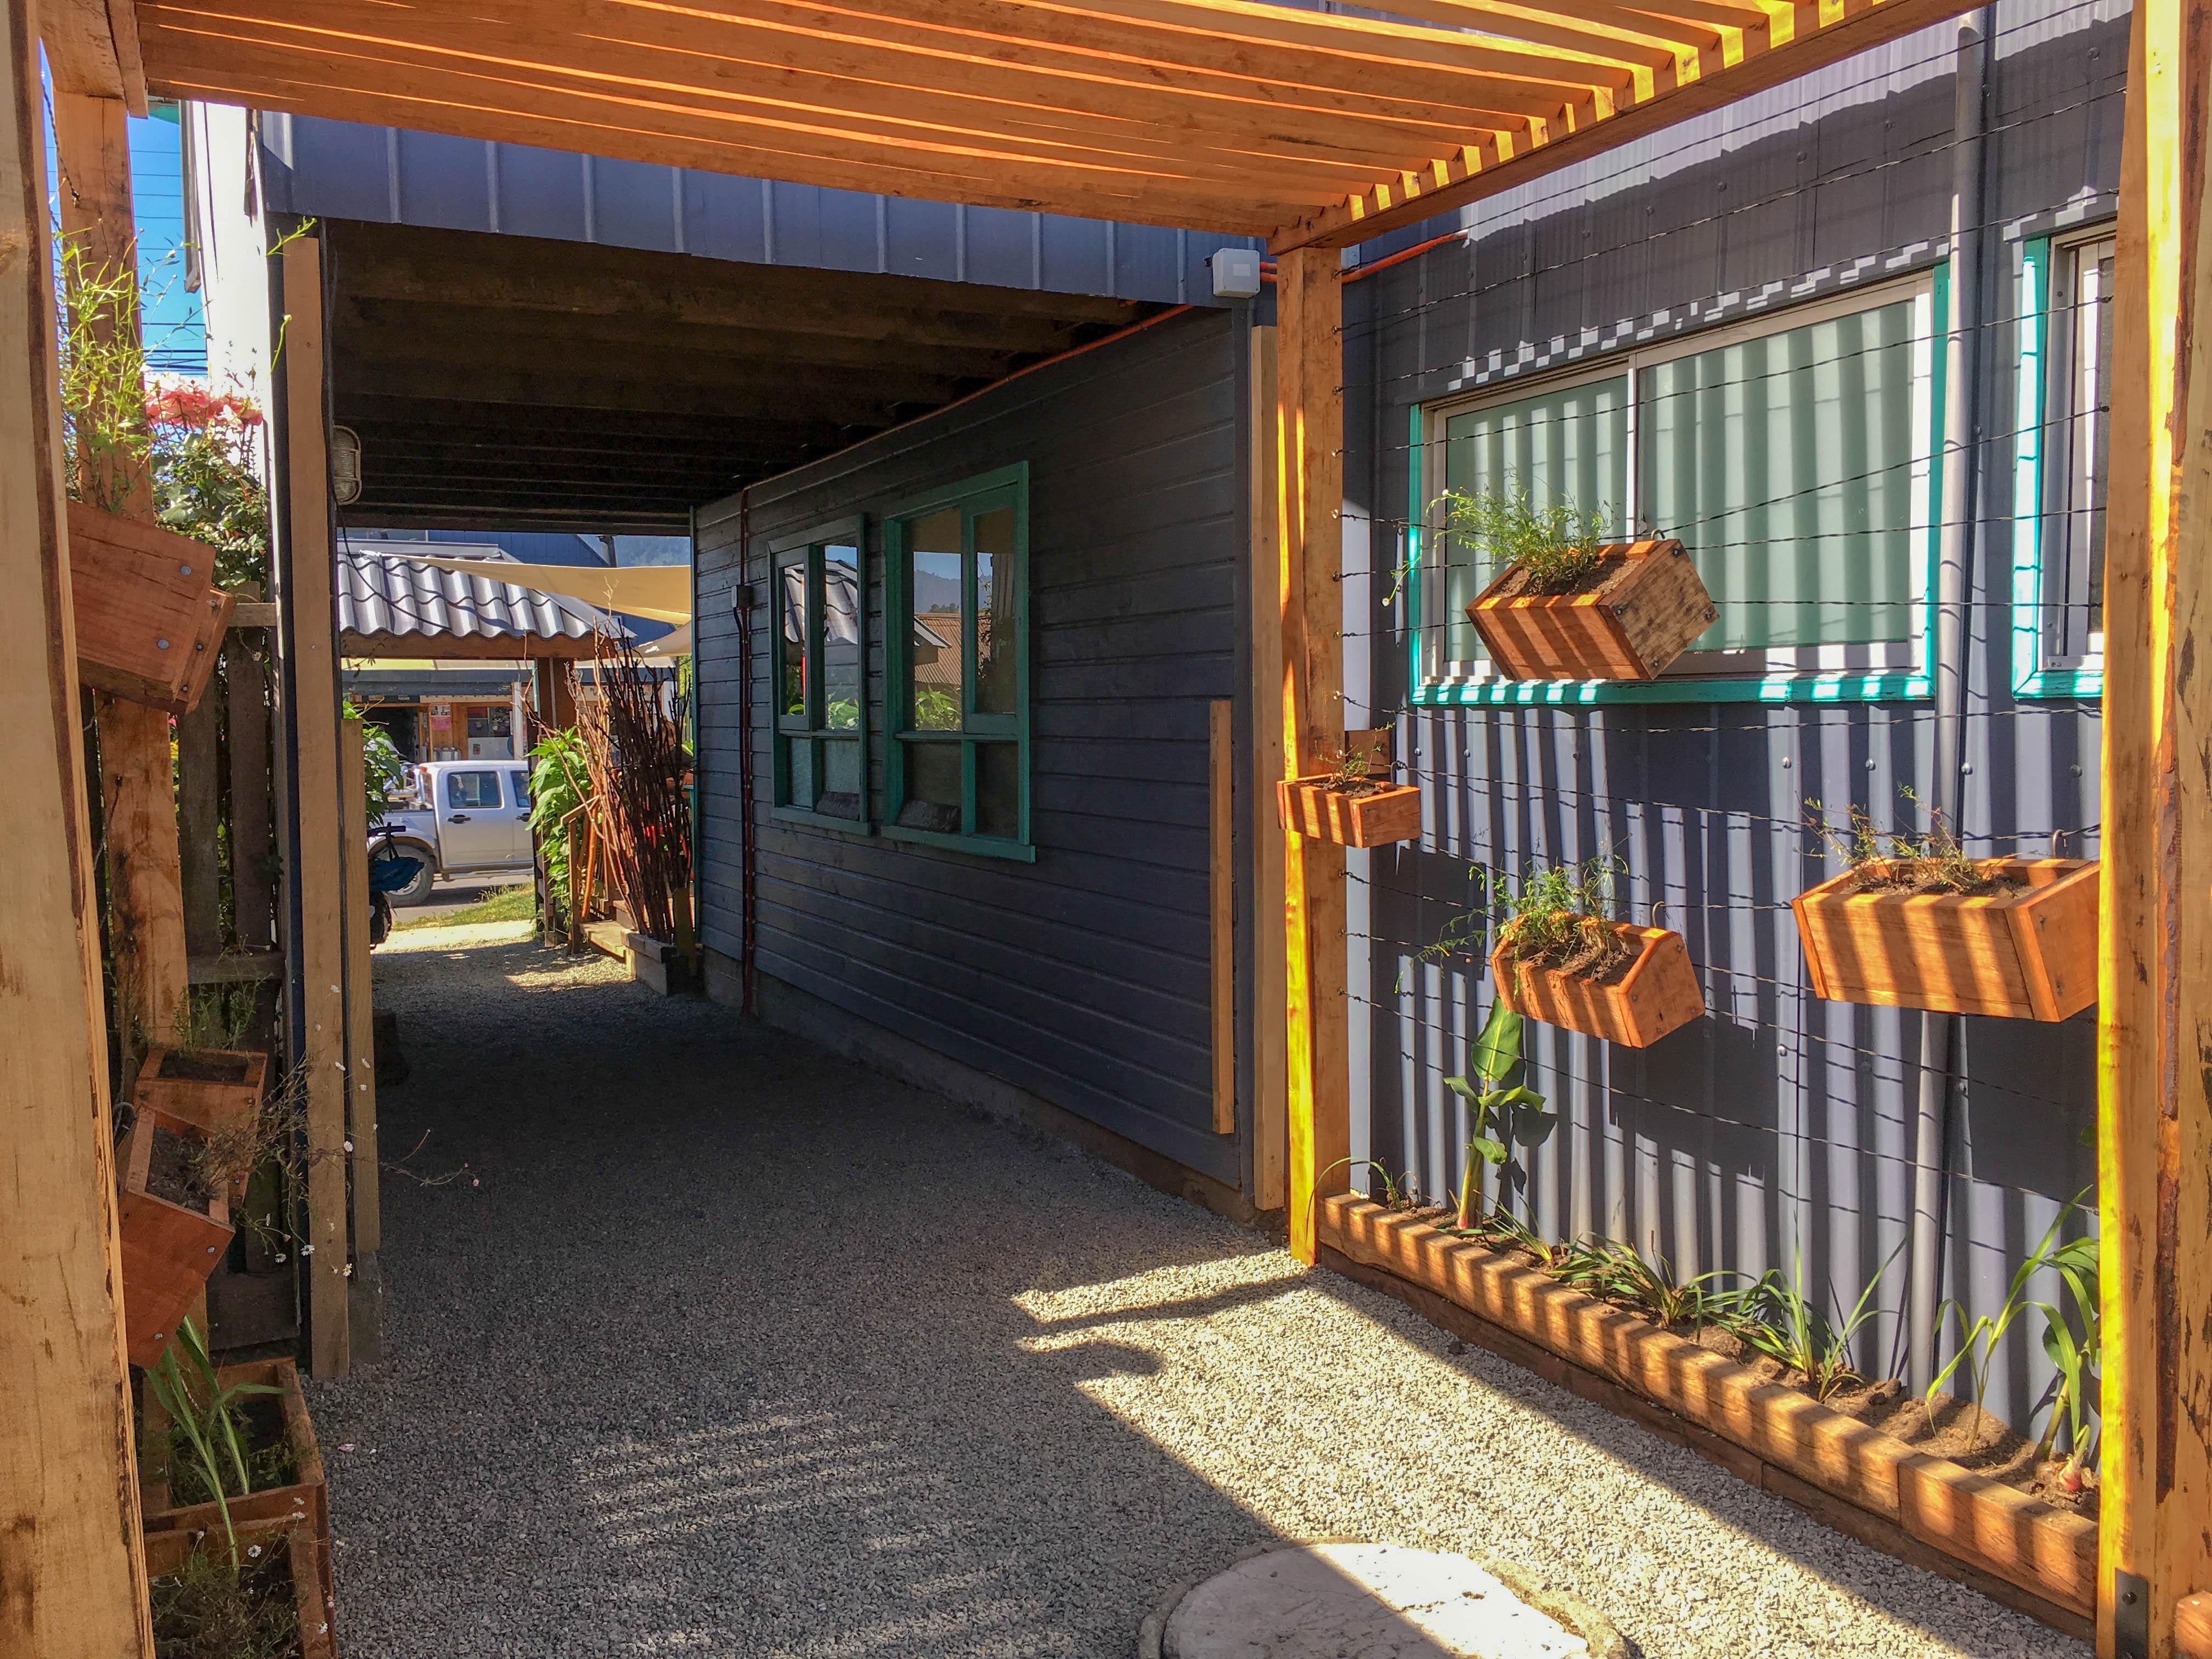 #patagonia_#surdechile_#lagoranco_#jardín_#paisajismo_#diseño_#futrono_#cuencadelranco-52